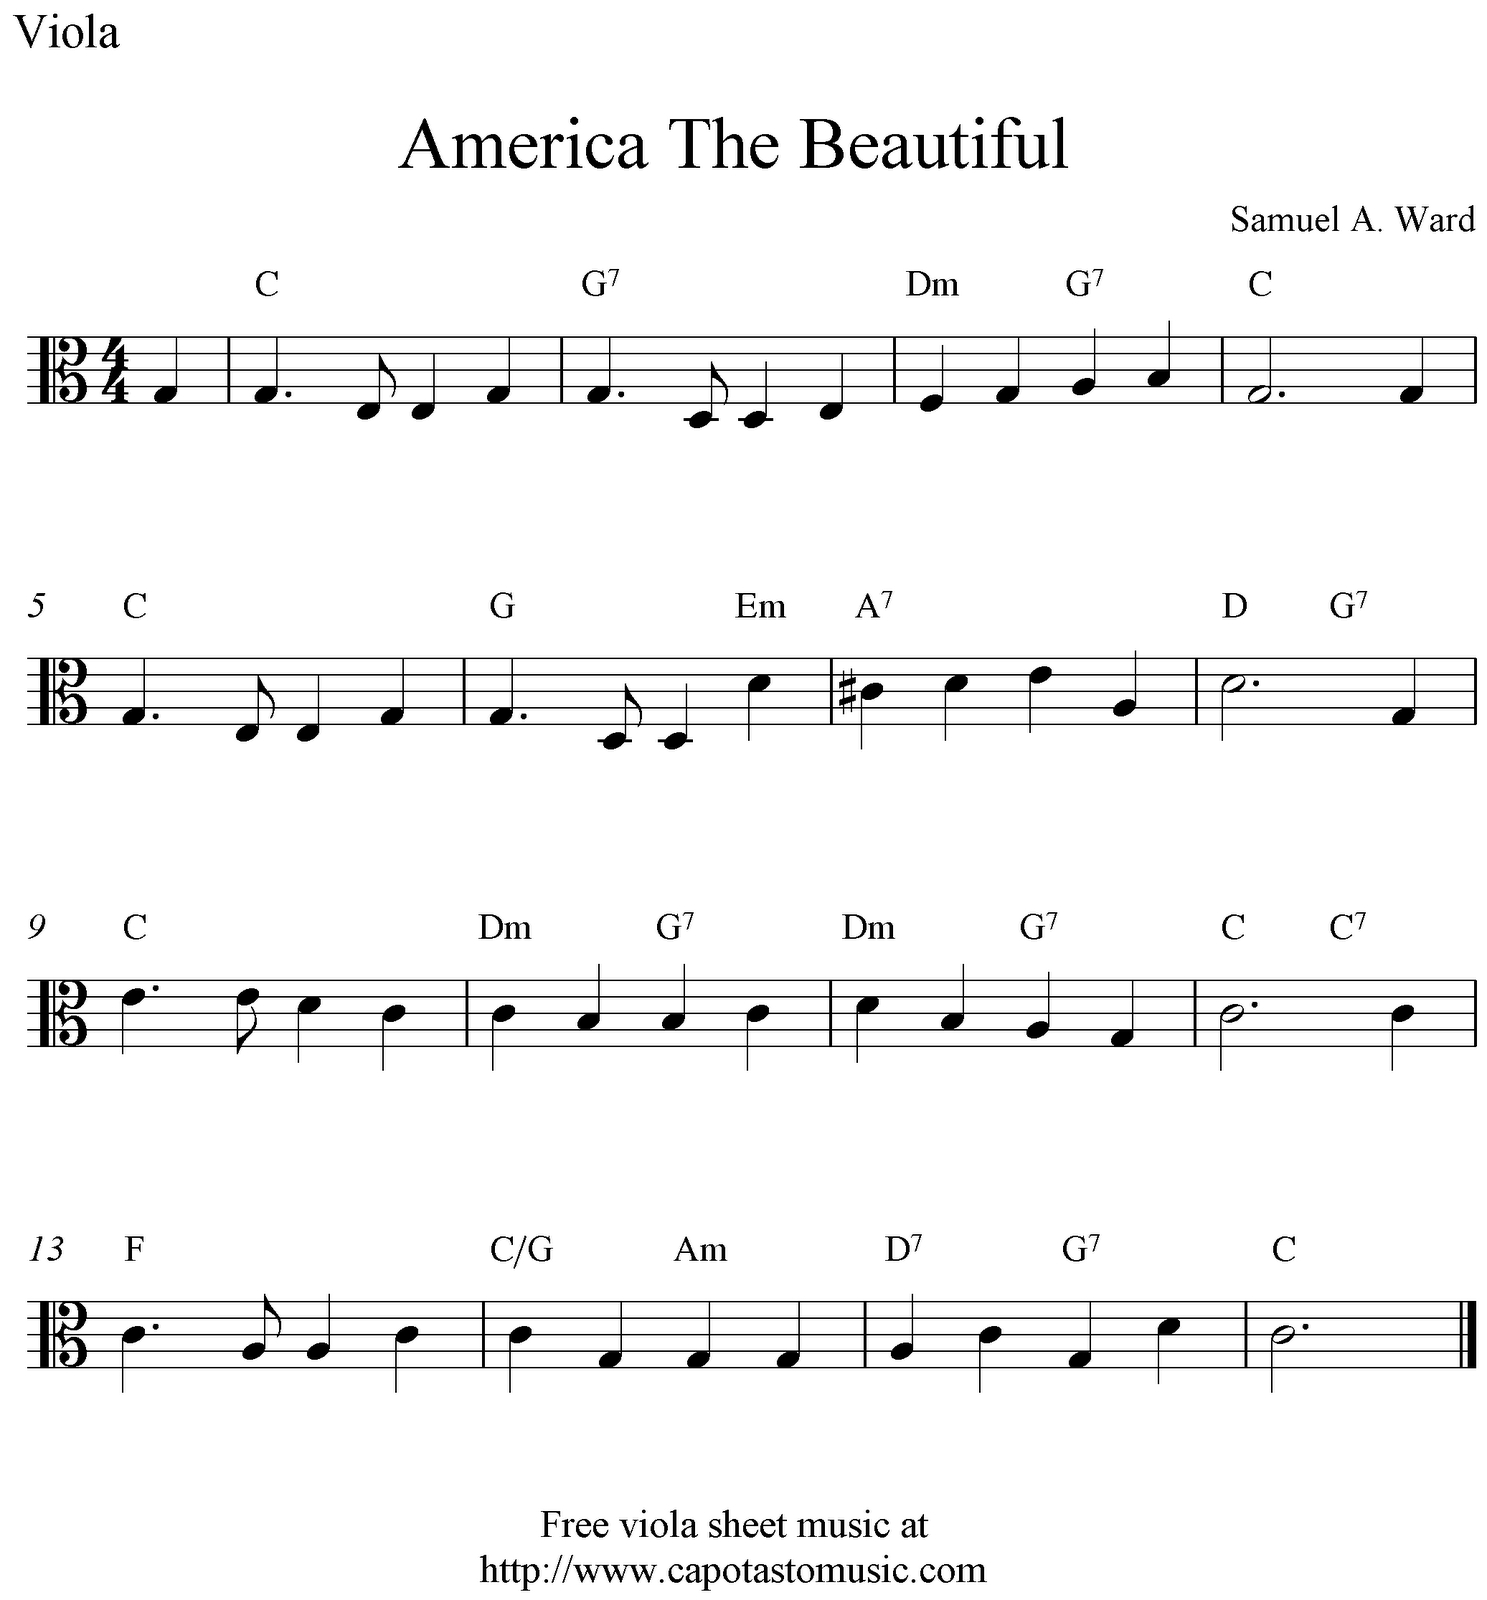 Free Viola Sheet Music, America The Beautiful | Viola Sheet Music In - Viola Sheet Music Free Printable